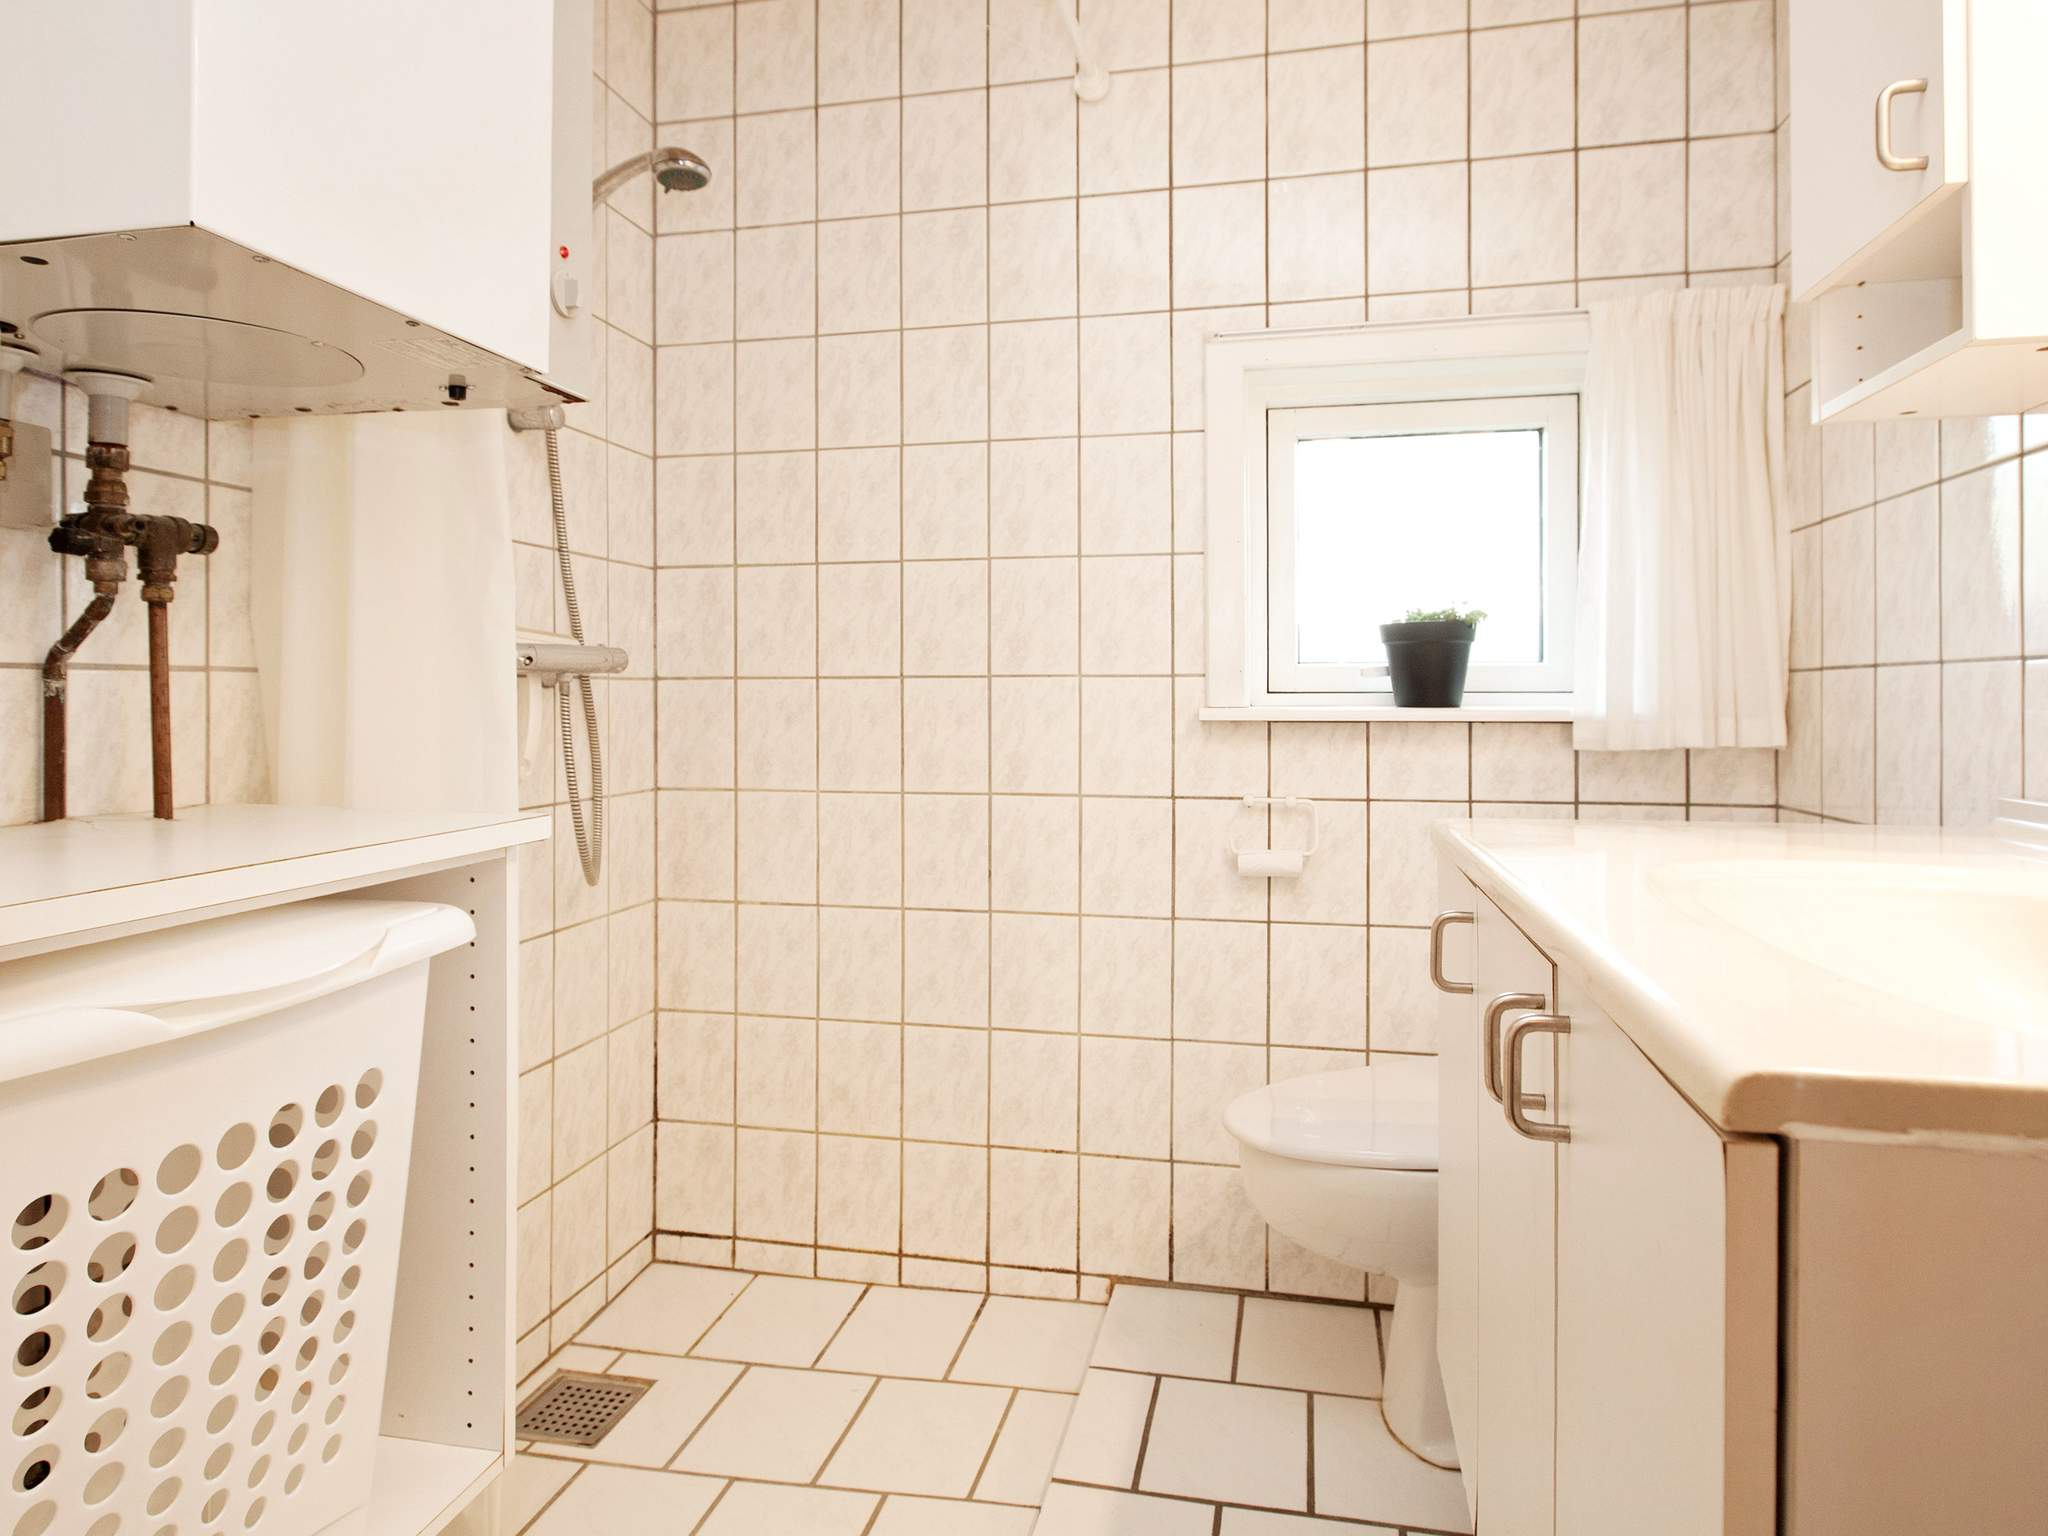 Maison de vacances Kramnitze (87262), Kramnitse, , Lolland, Danemark, image 17